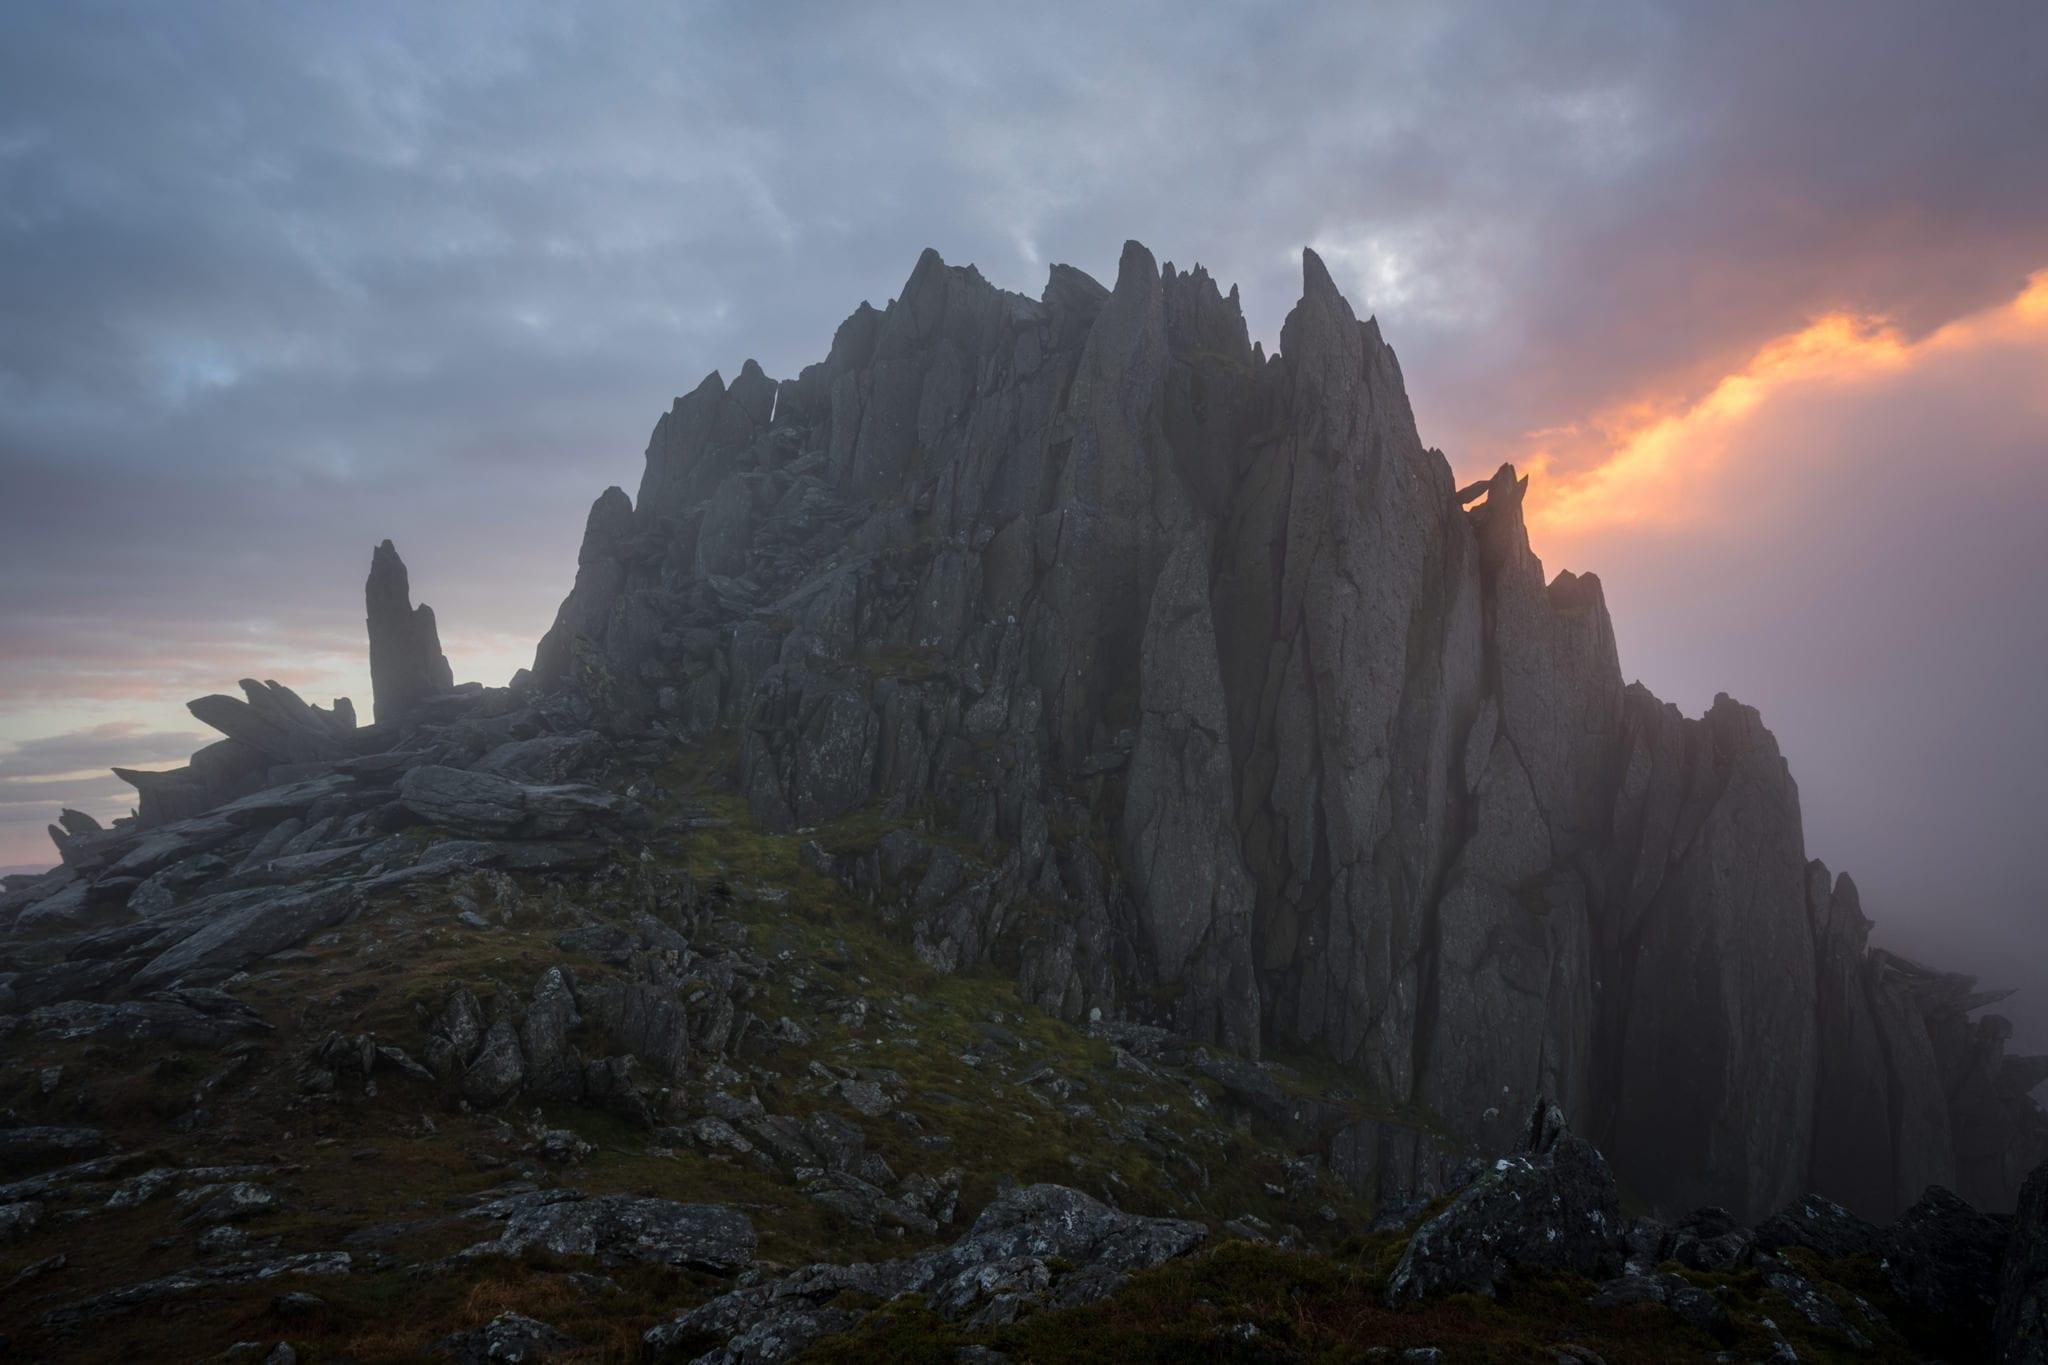 Castell y Gwynt Moods - Snowdonia Wild Camping Photography Workshop